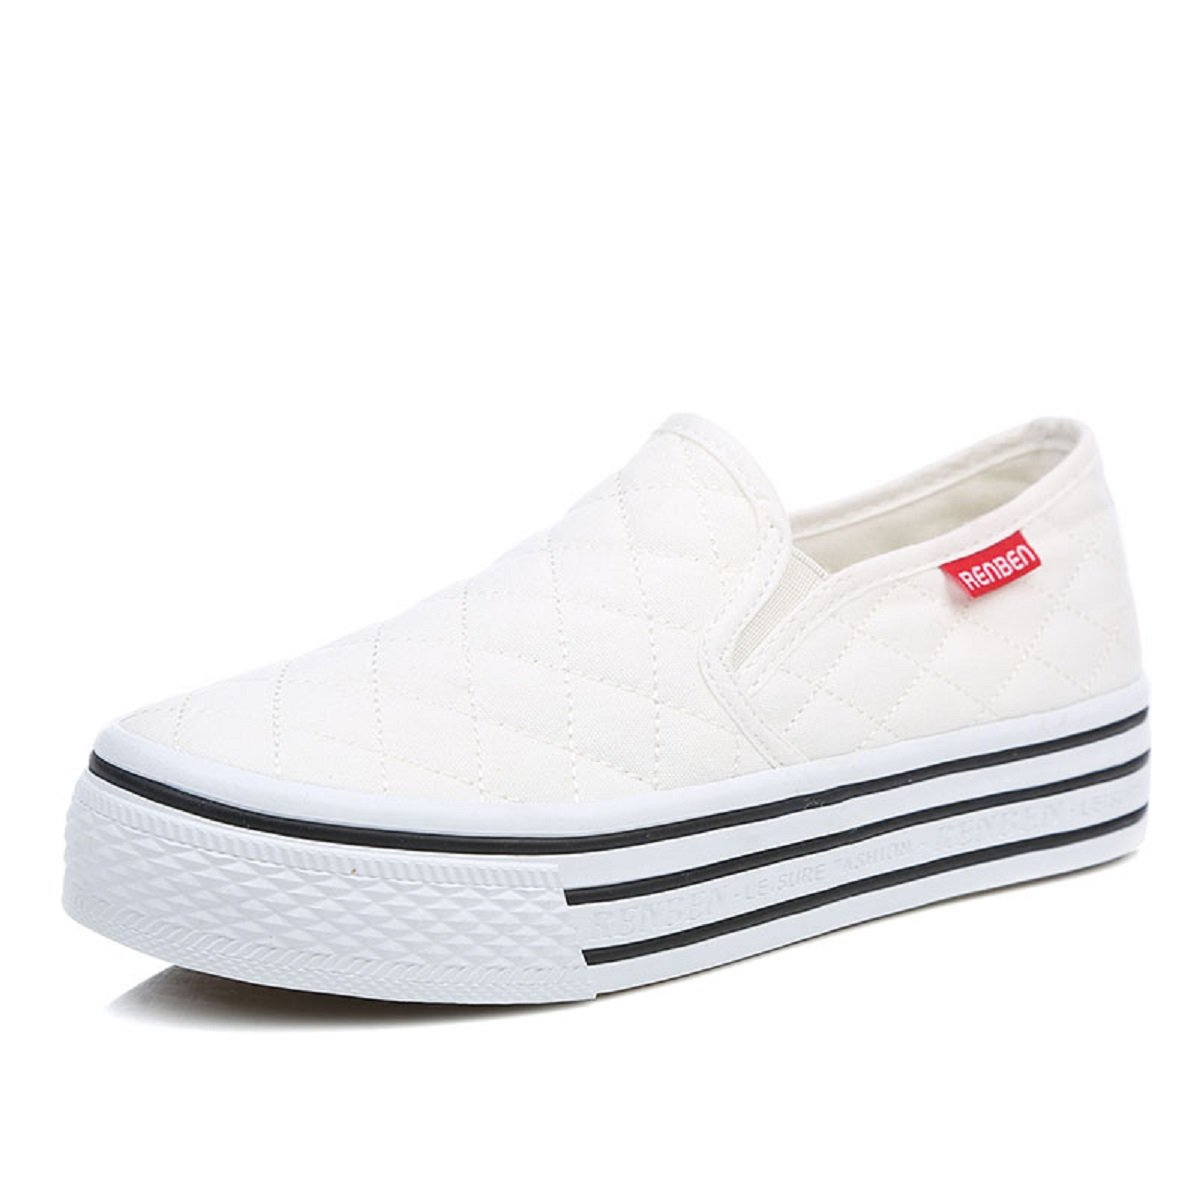 Renben Womens Canvas Slip On Flat Casual Sneaker Platform Fashion Low Top Shoes